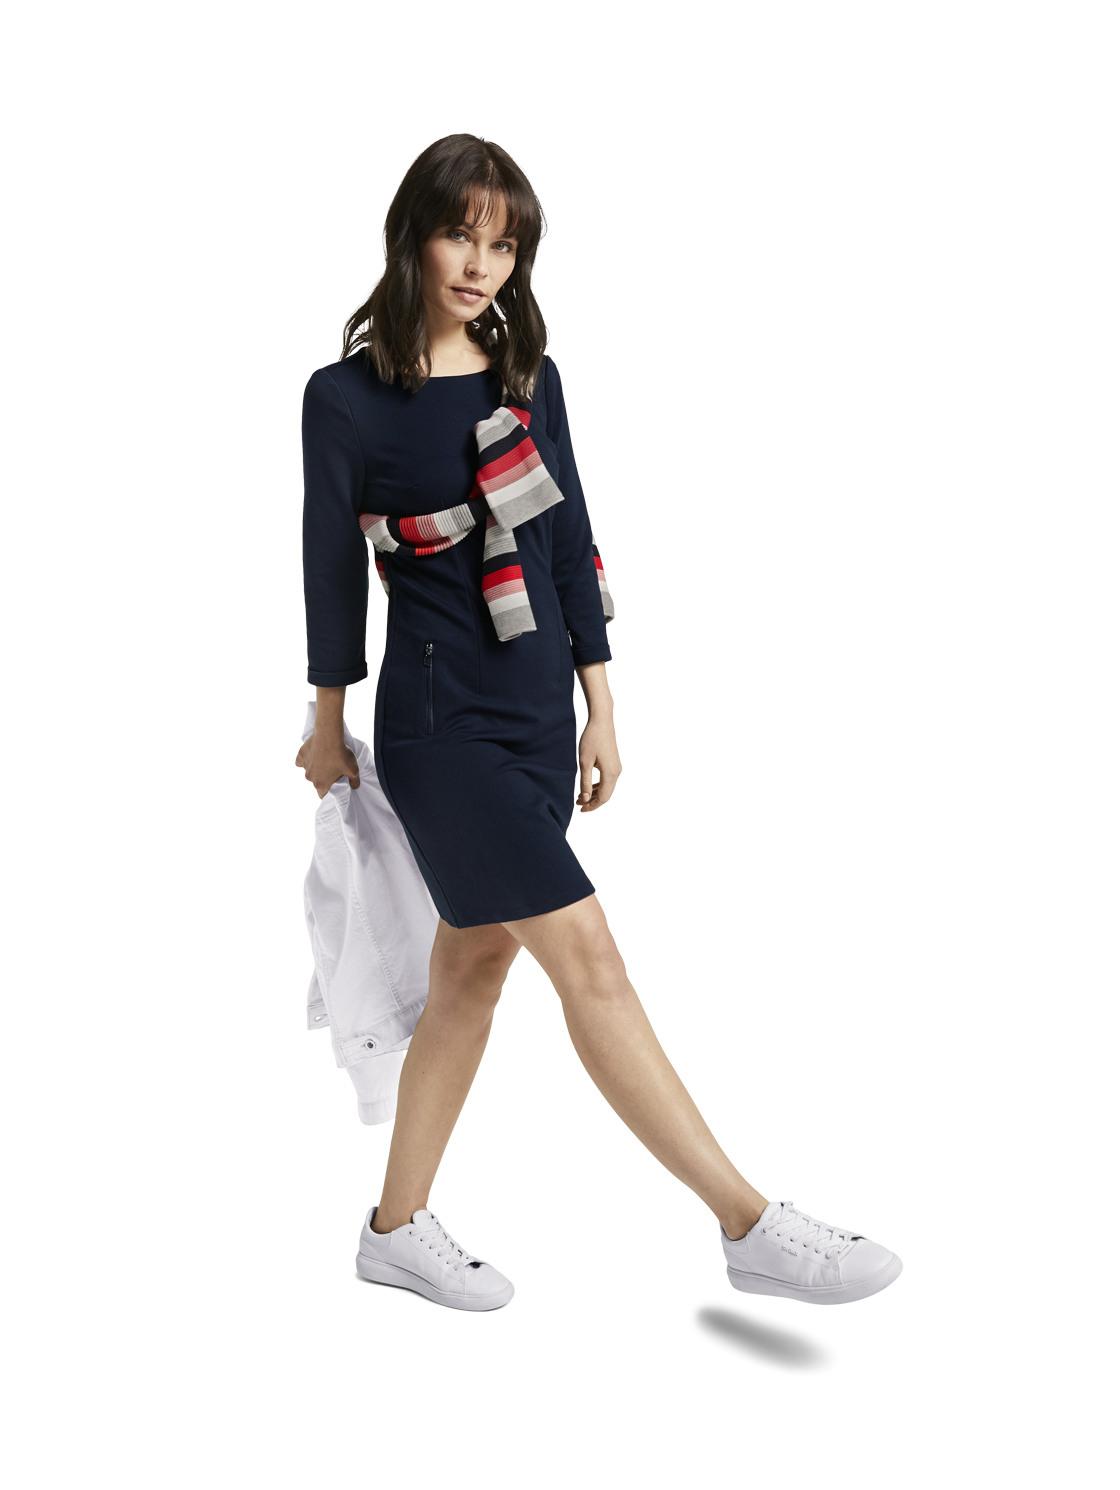 Tom Tailor Kleid 10599118  Kleider  Damen  Wöhrl Onlineshop